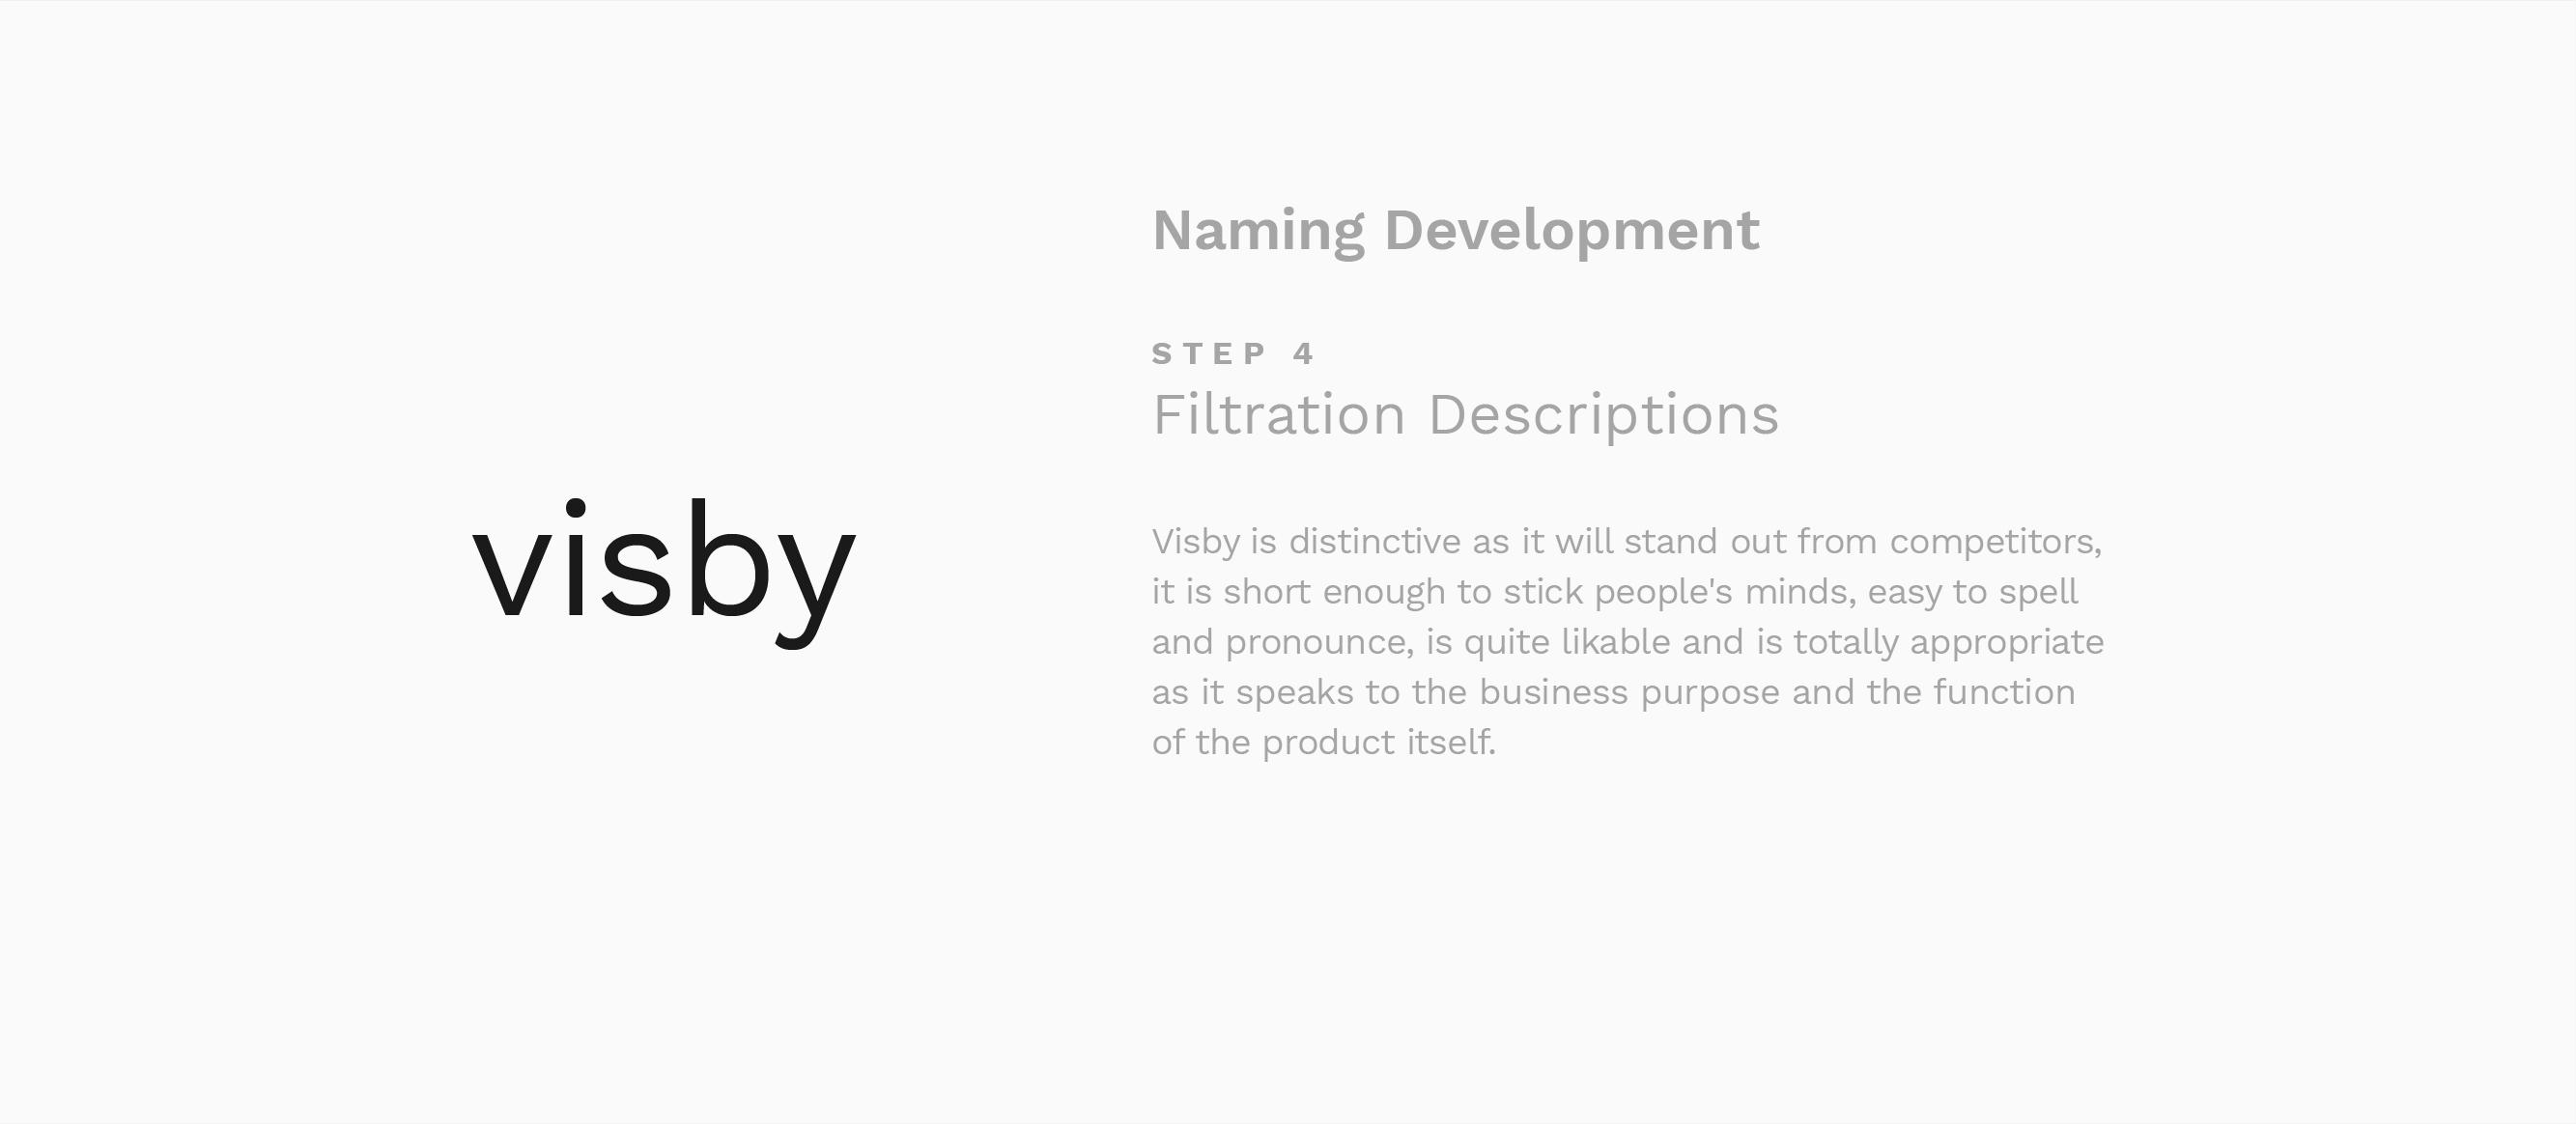 visby-NameFilter-04